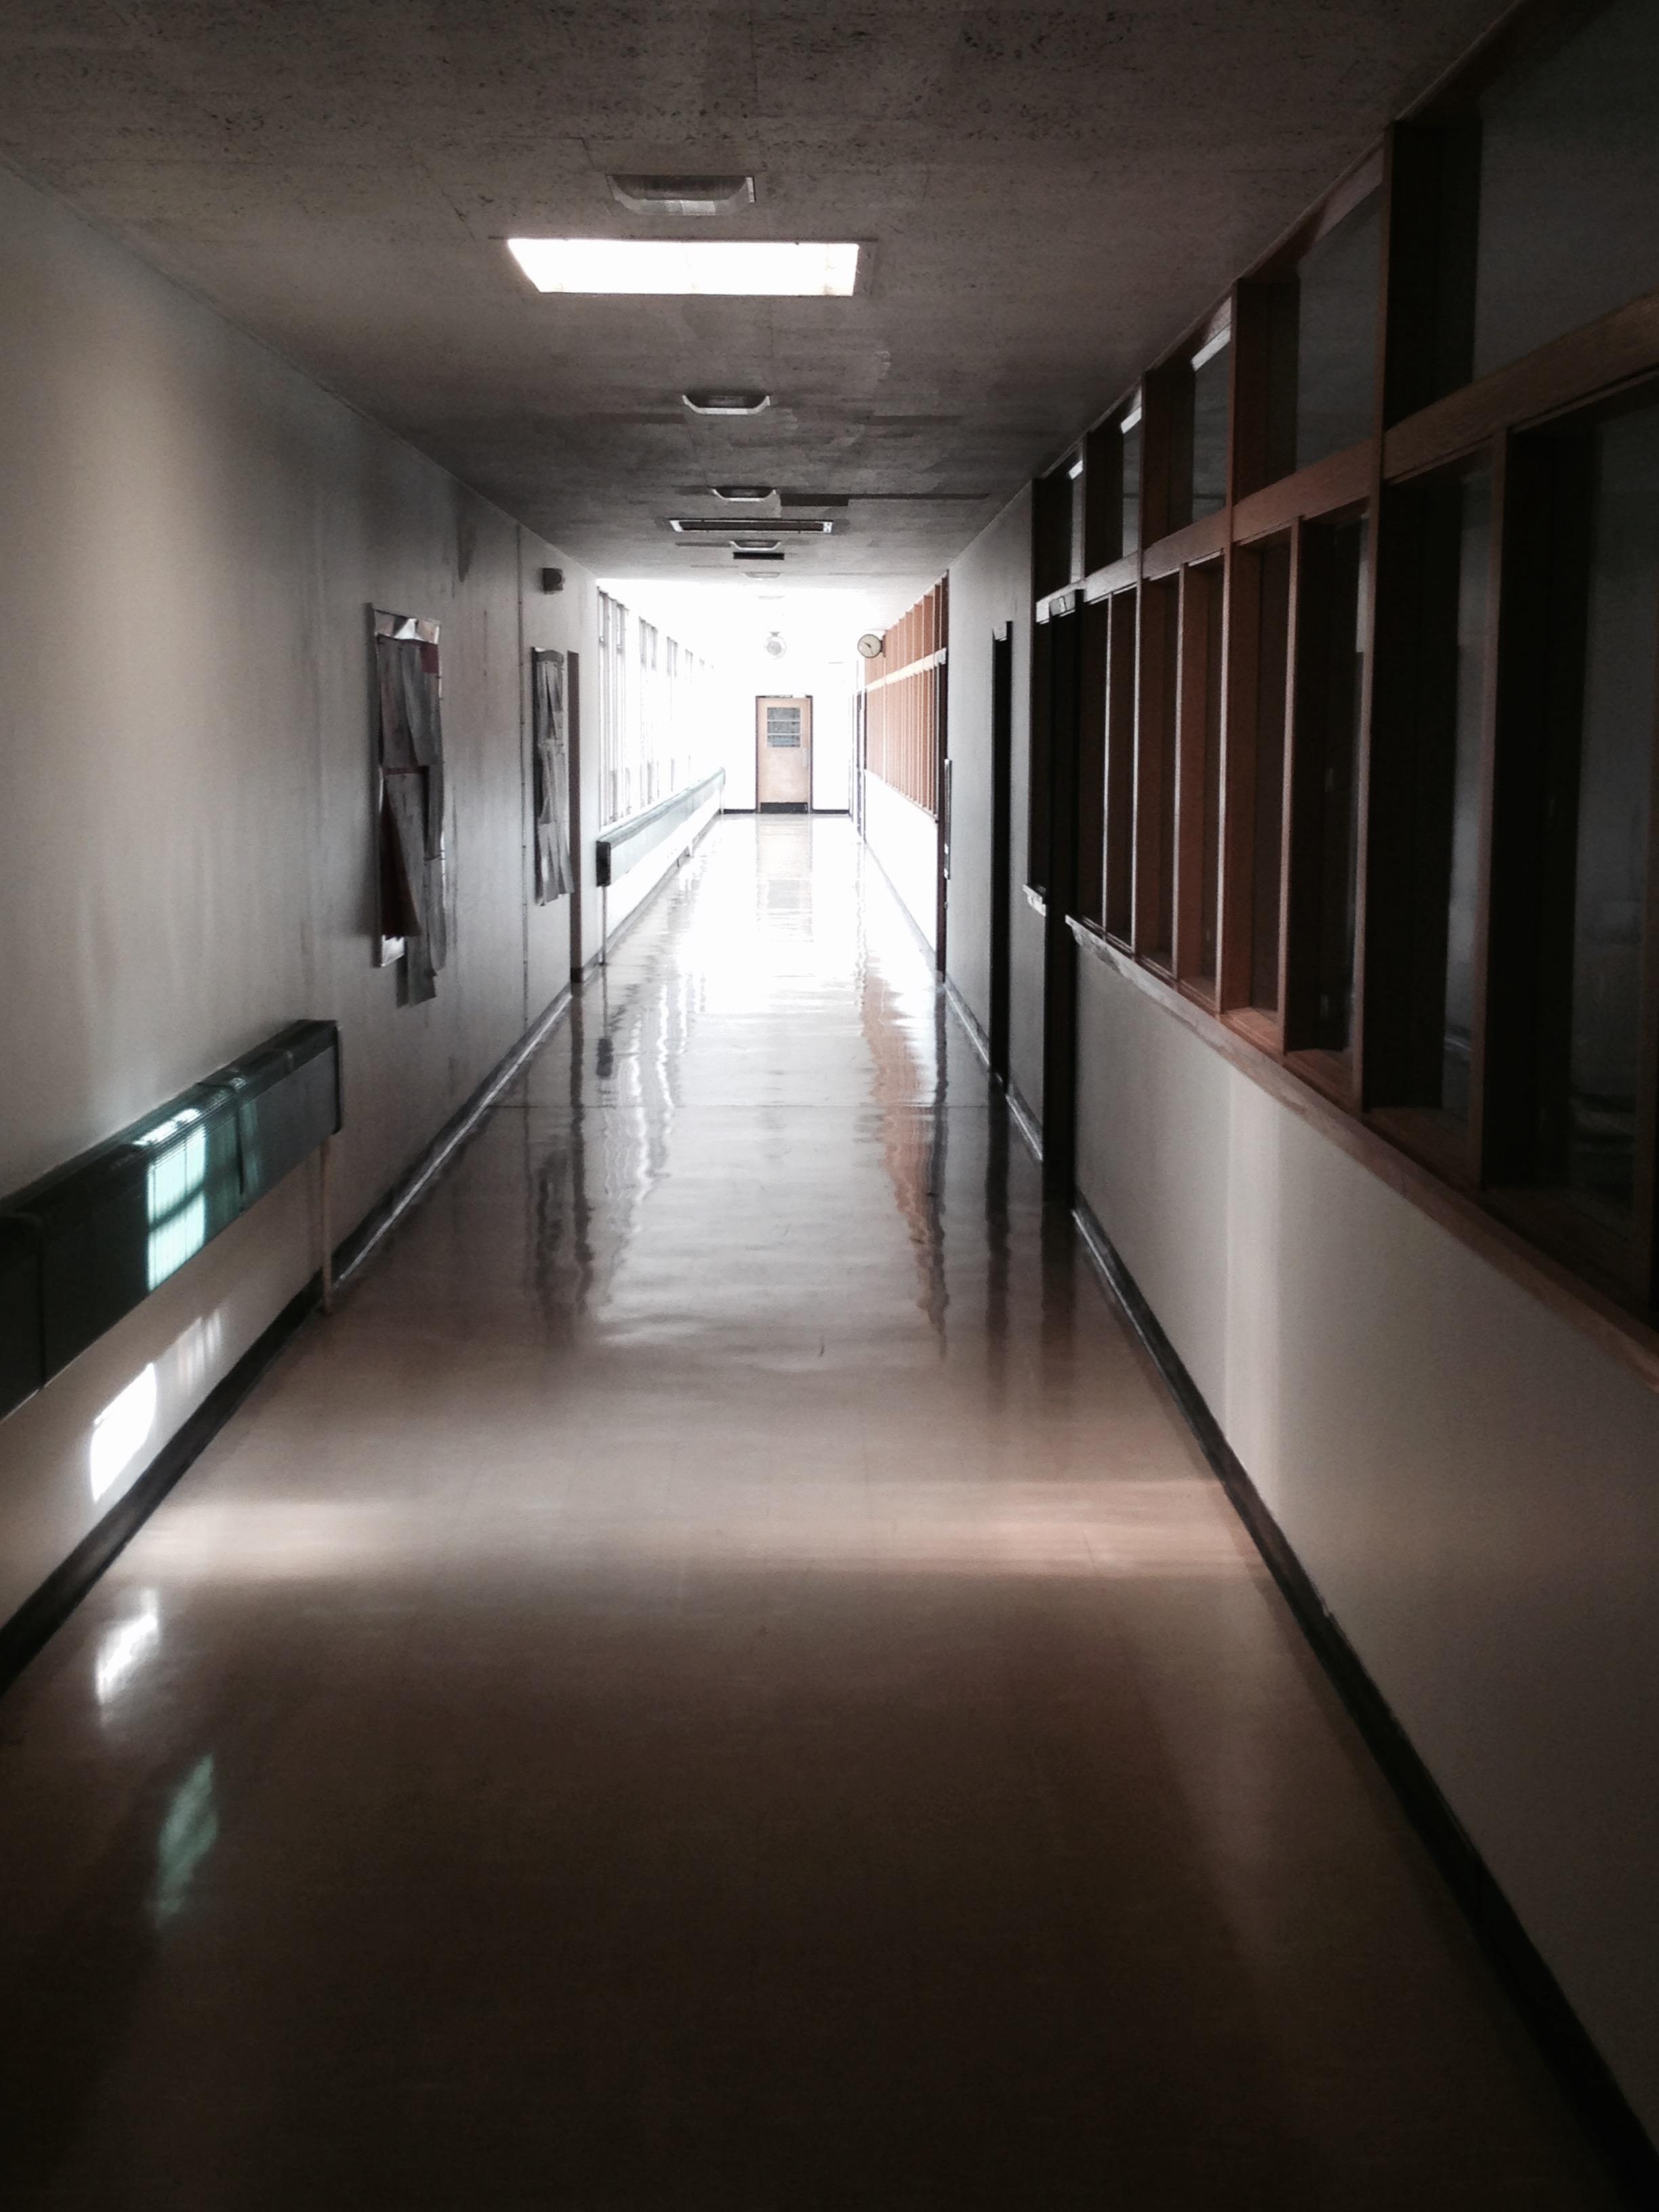 File:Dark Hallway